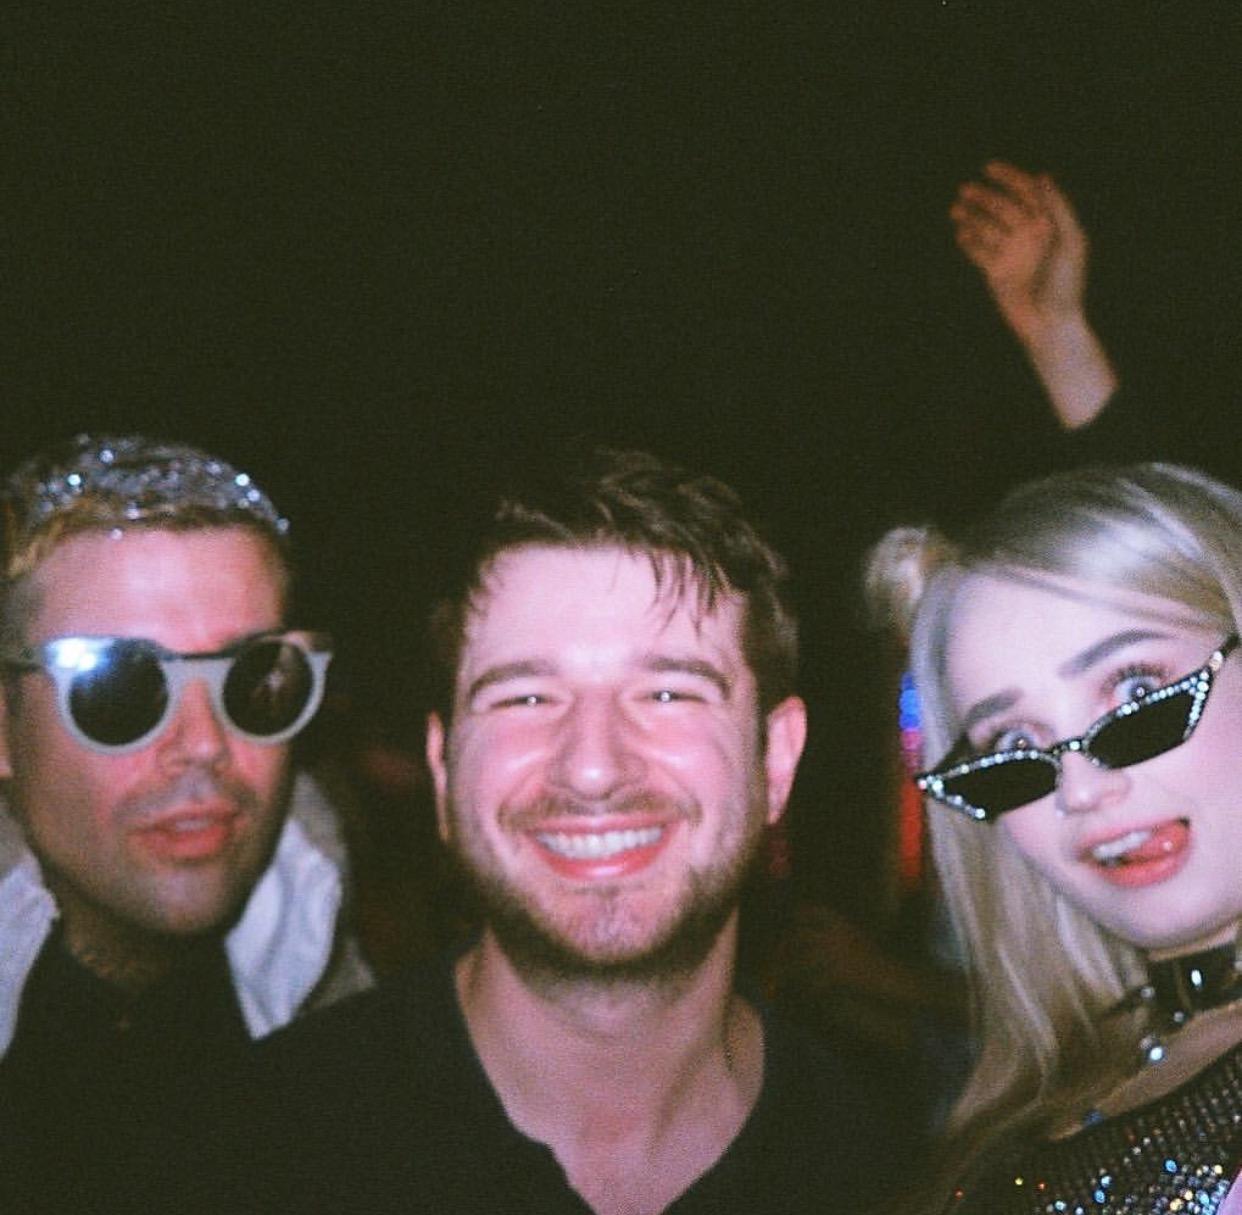 Jesse Saint John (left), Alex Chapman (center), Kim Petras (right)